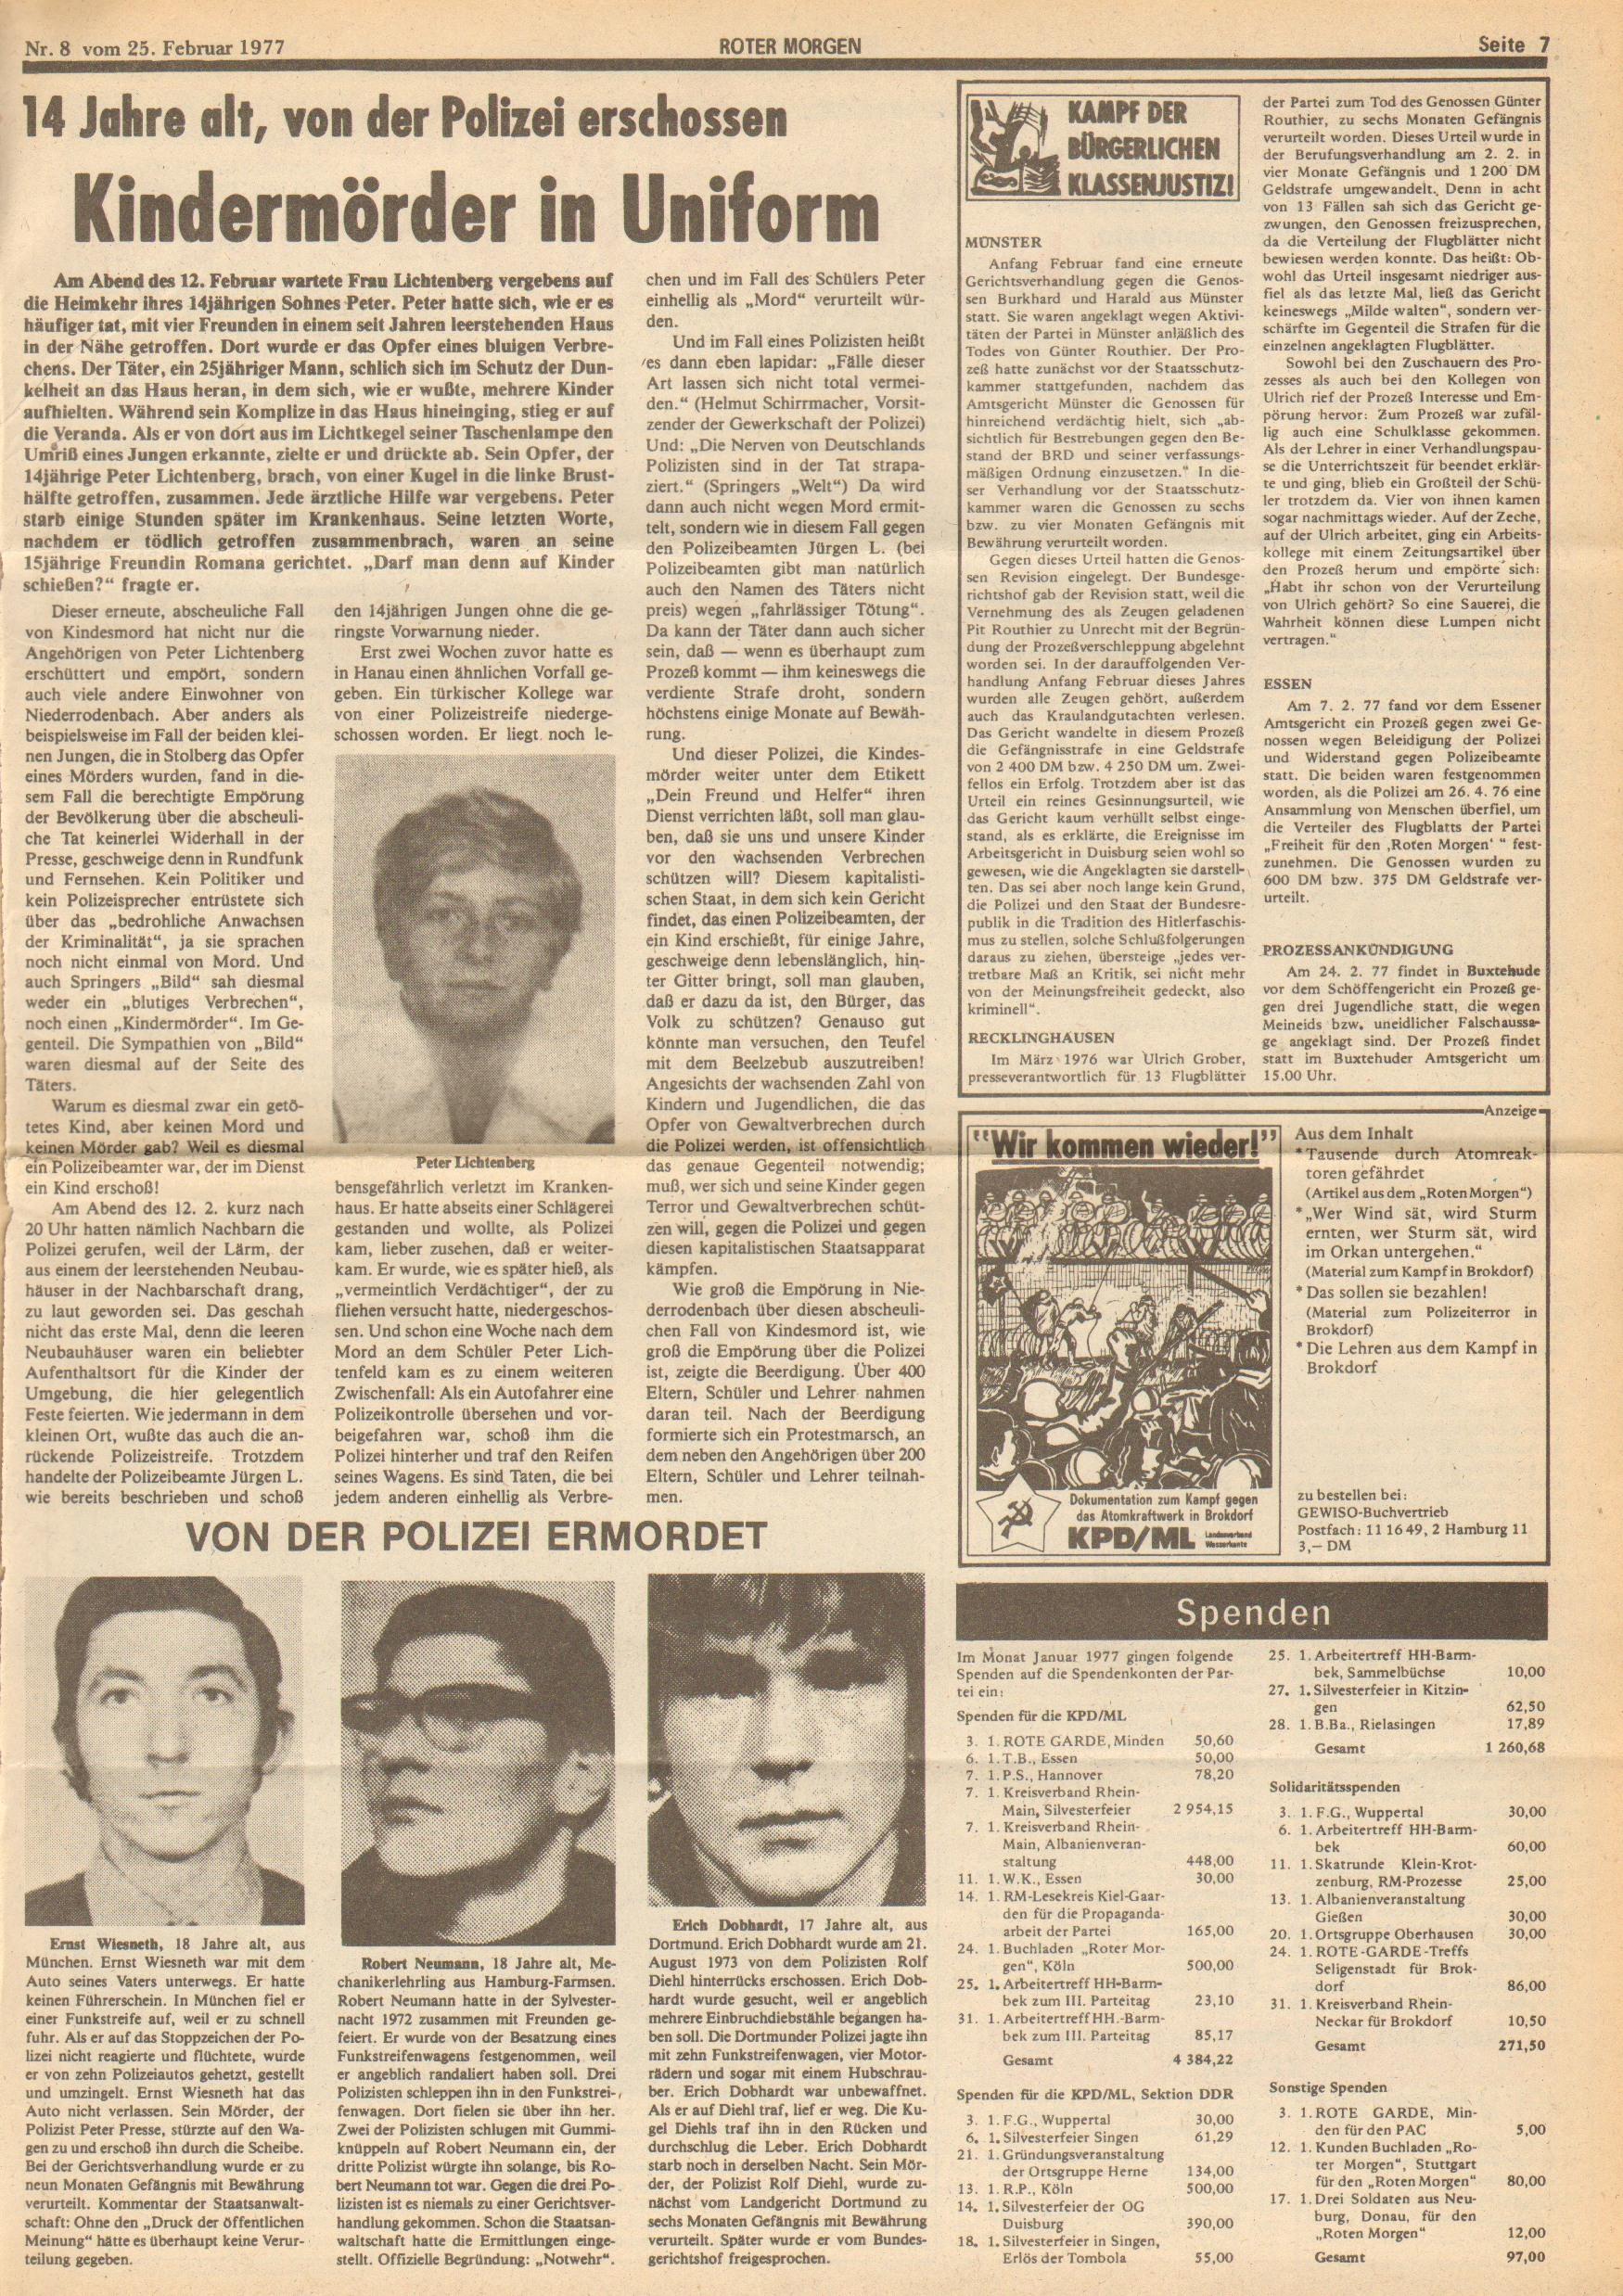 Roter Morgen, 11. Jg.,25. Februar 1977, Nr. 8, Seite 7